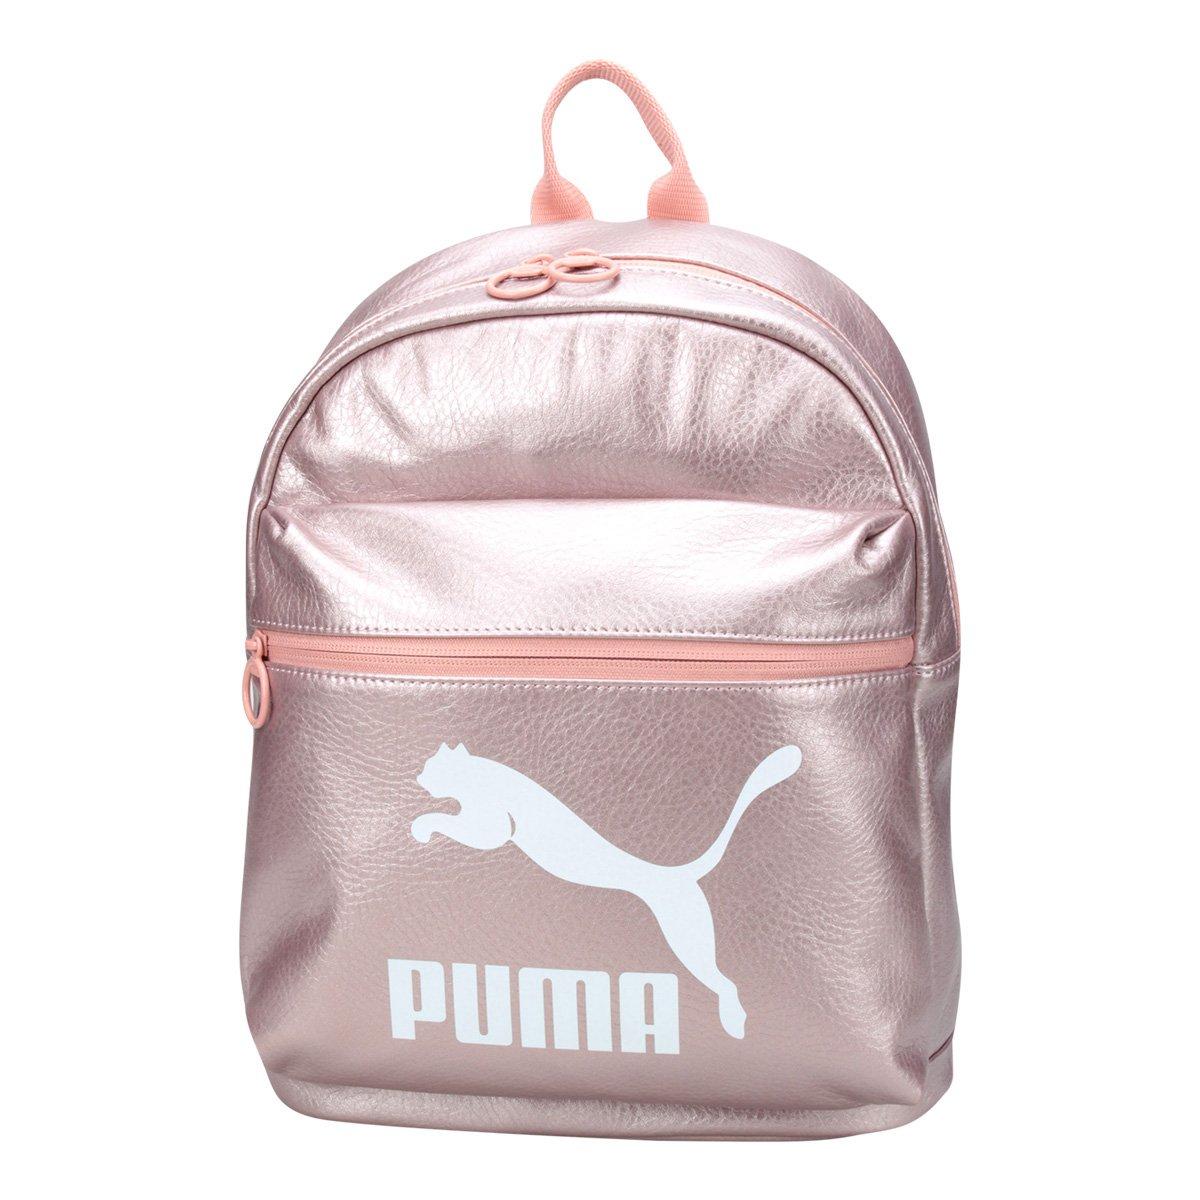 a7f4f8396 Mochila Puma Prime Backpack Metallic Feminina | Livelo -Sua Vida com ...